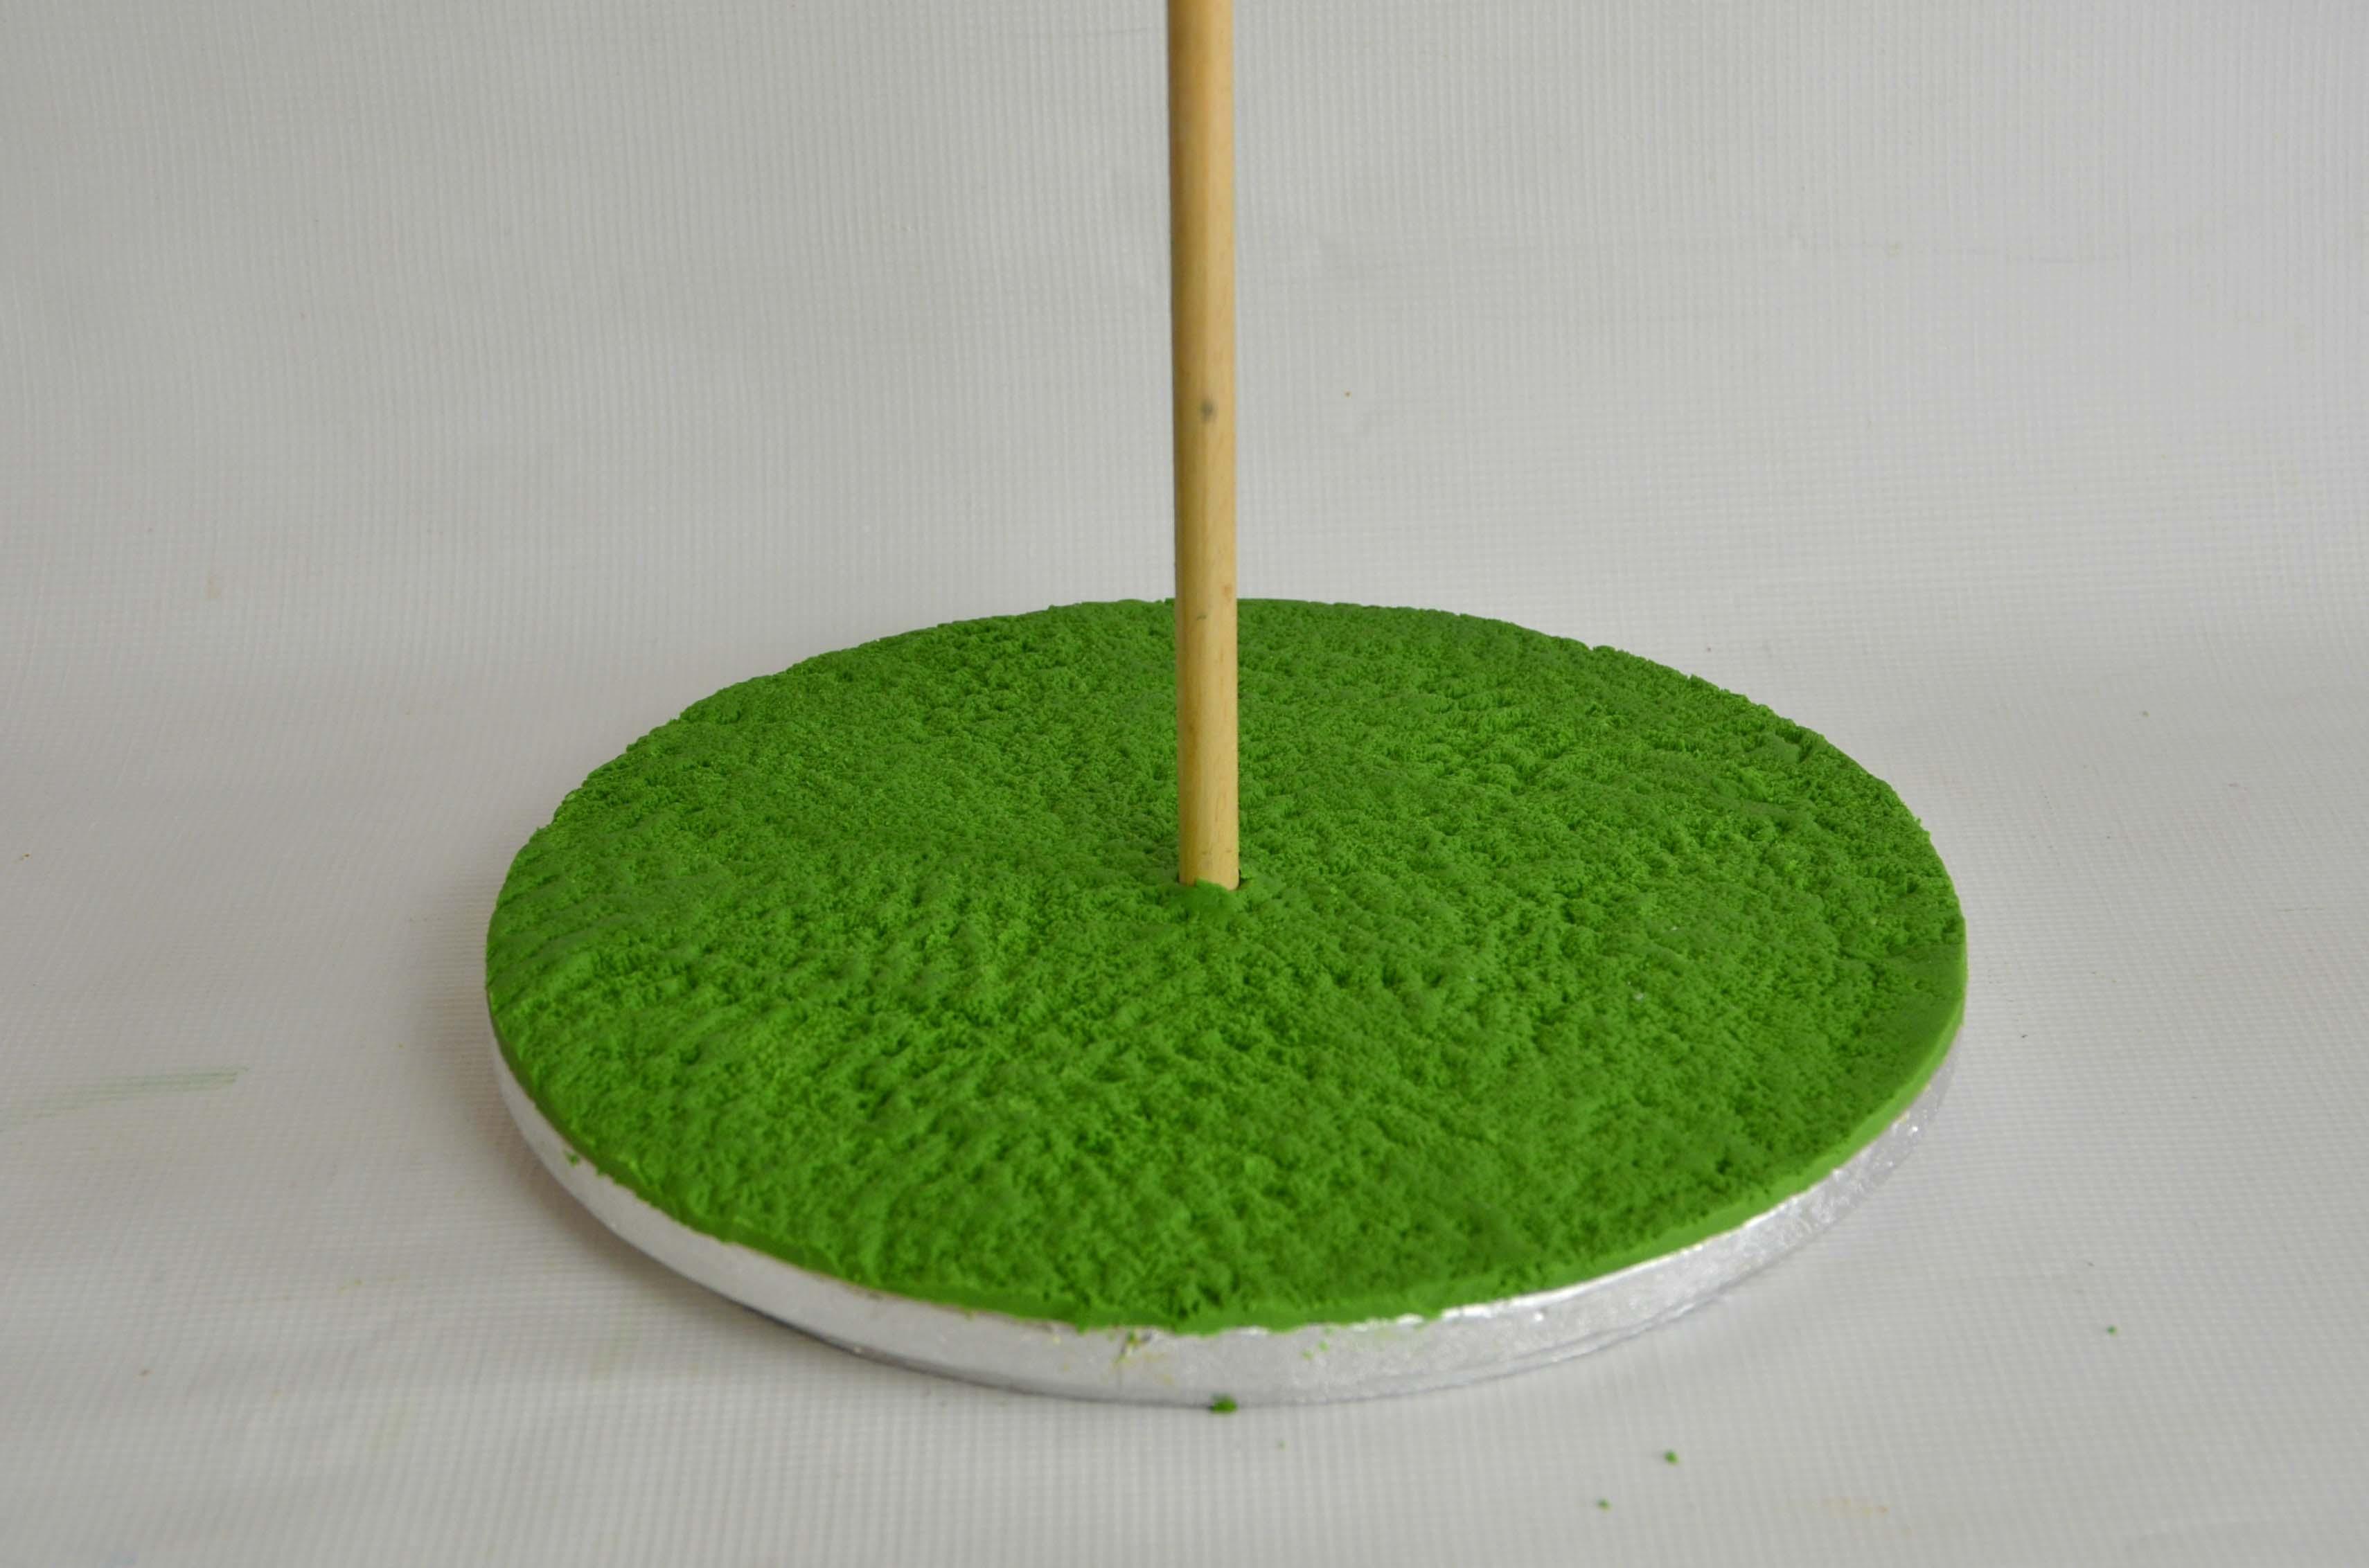 Brushed green sugarpaste